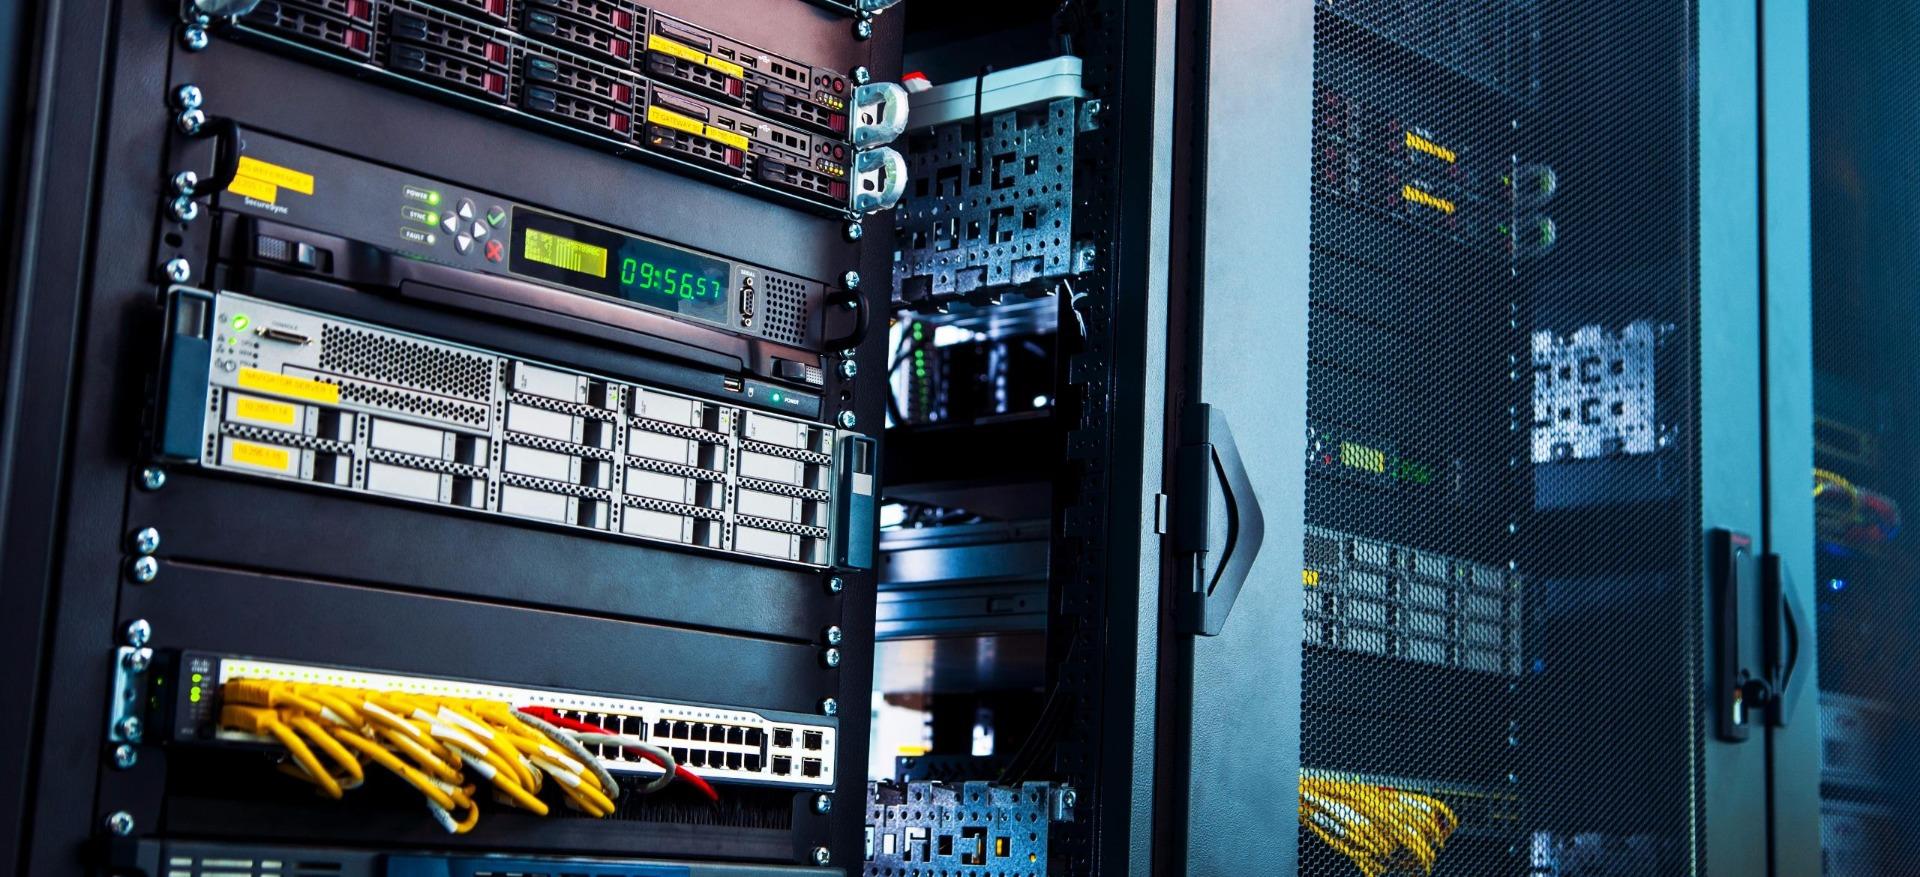 Network Equipment | Cisco, HP, Juniper, Dell | Flux IT | Flux IT